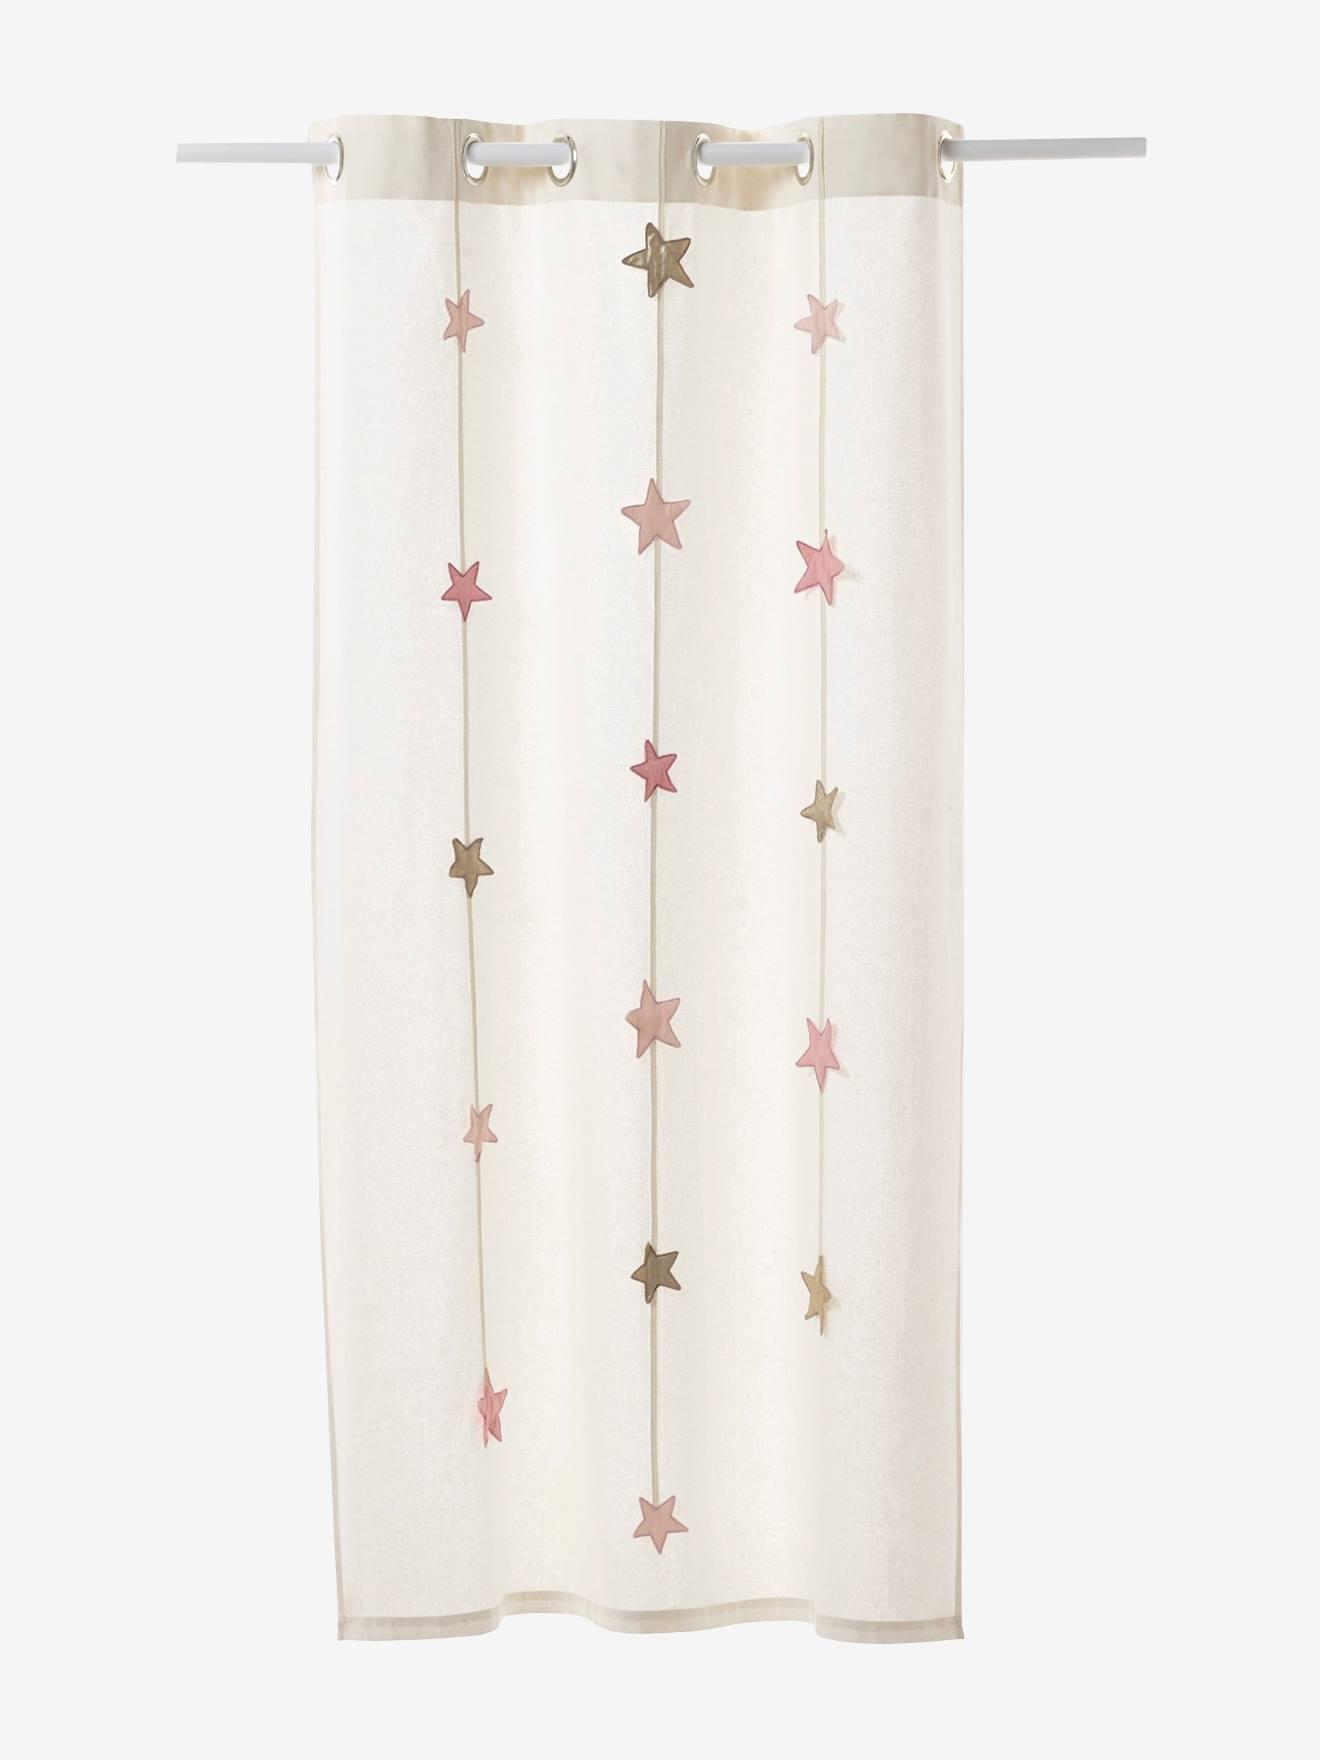 rideau occultant petite hauteur affordable rideau chambre with rideau occultant petite hauteur. Black Bedroom Furniture Sets. Home Design Ideas